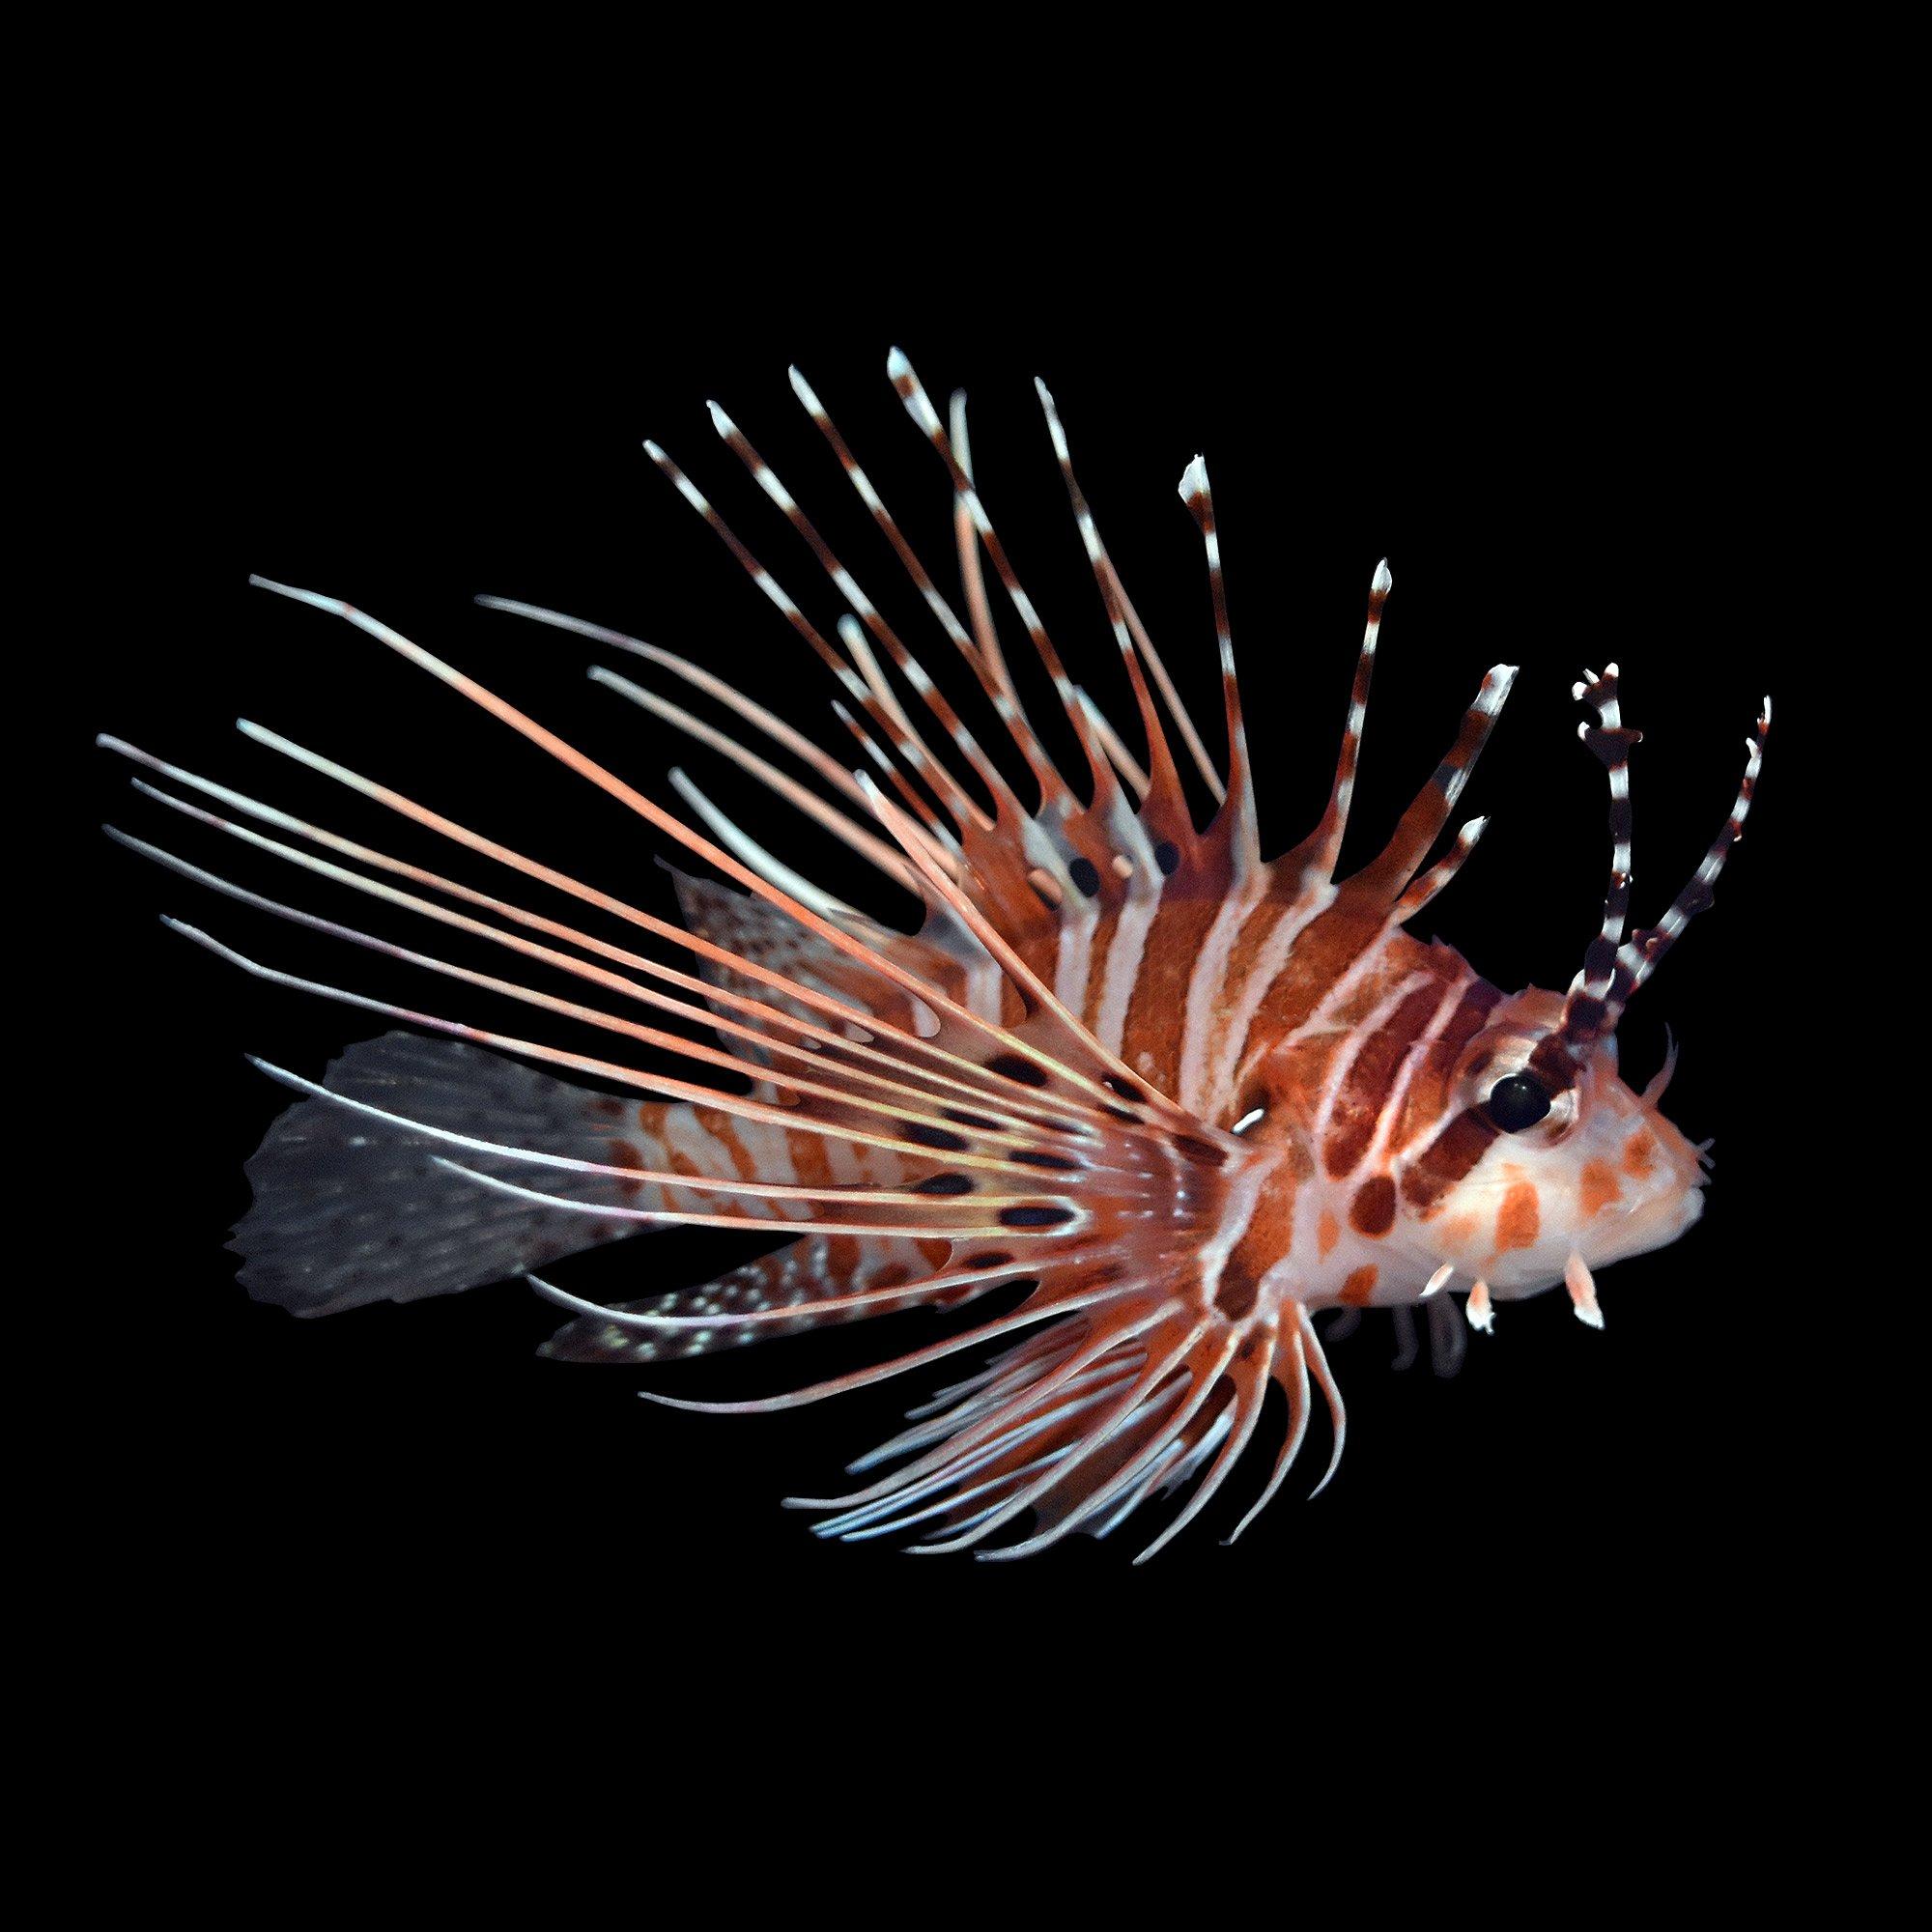 Antennata lionfish petco for Petco saltwater fish